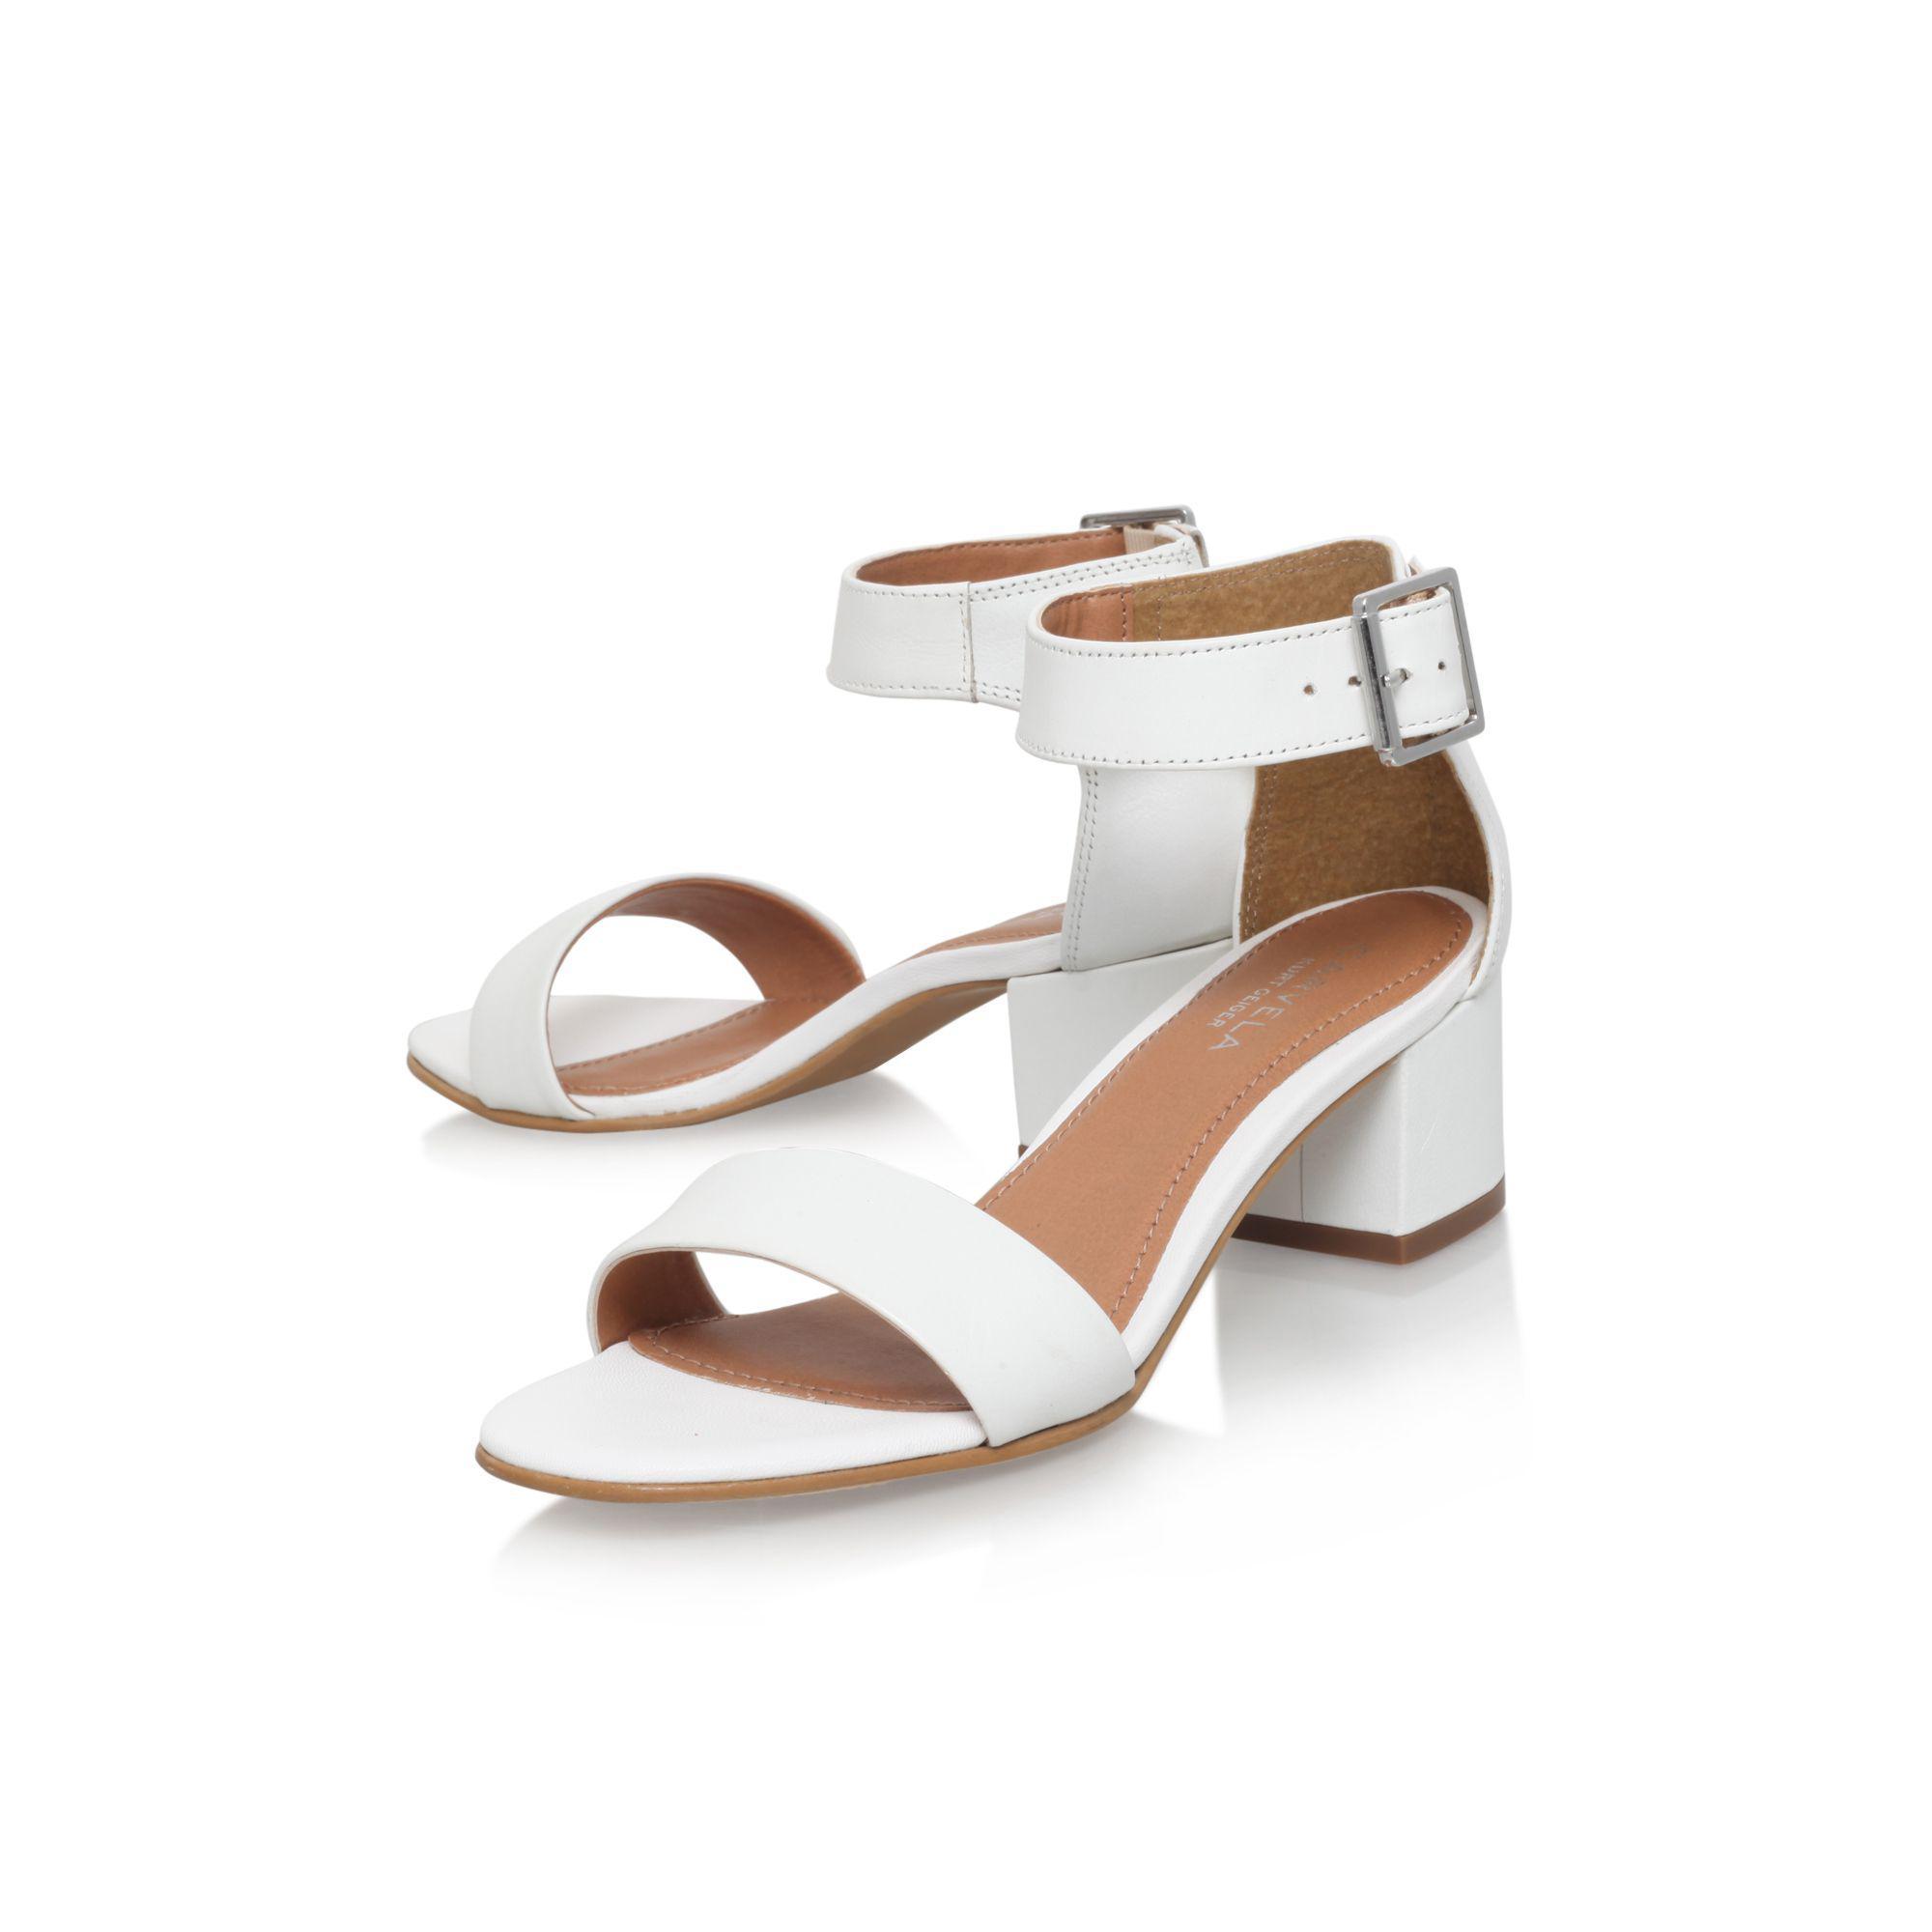 62f5a95fbc88 Carvela Kurt Geiger - White  shadow  High Heel Sandals - Lyst. View  fullscreen